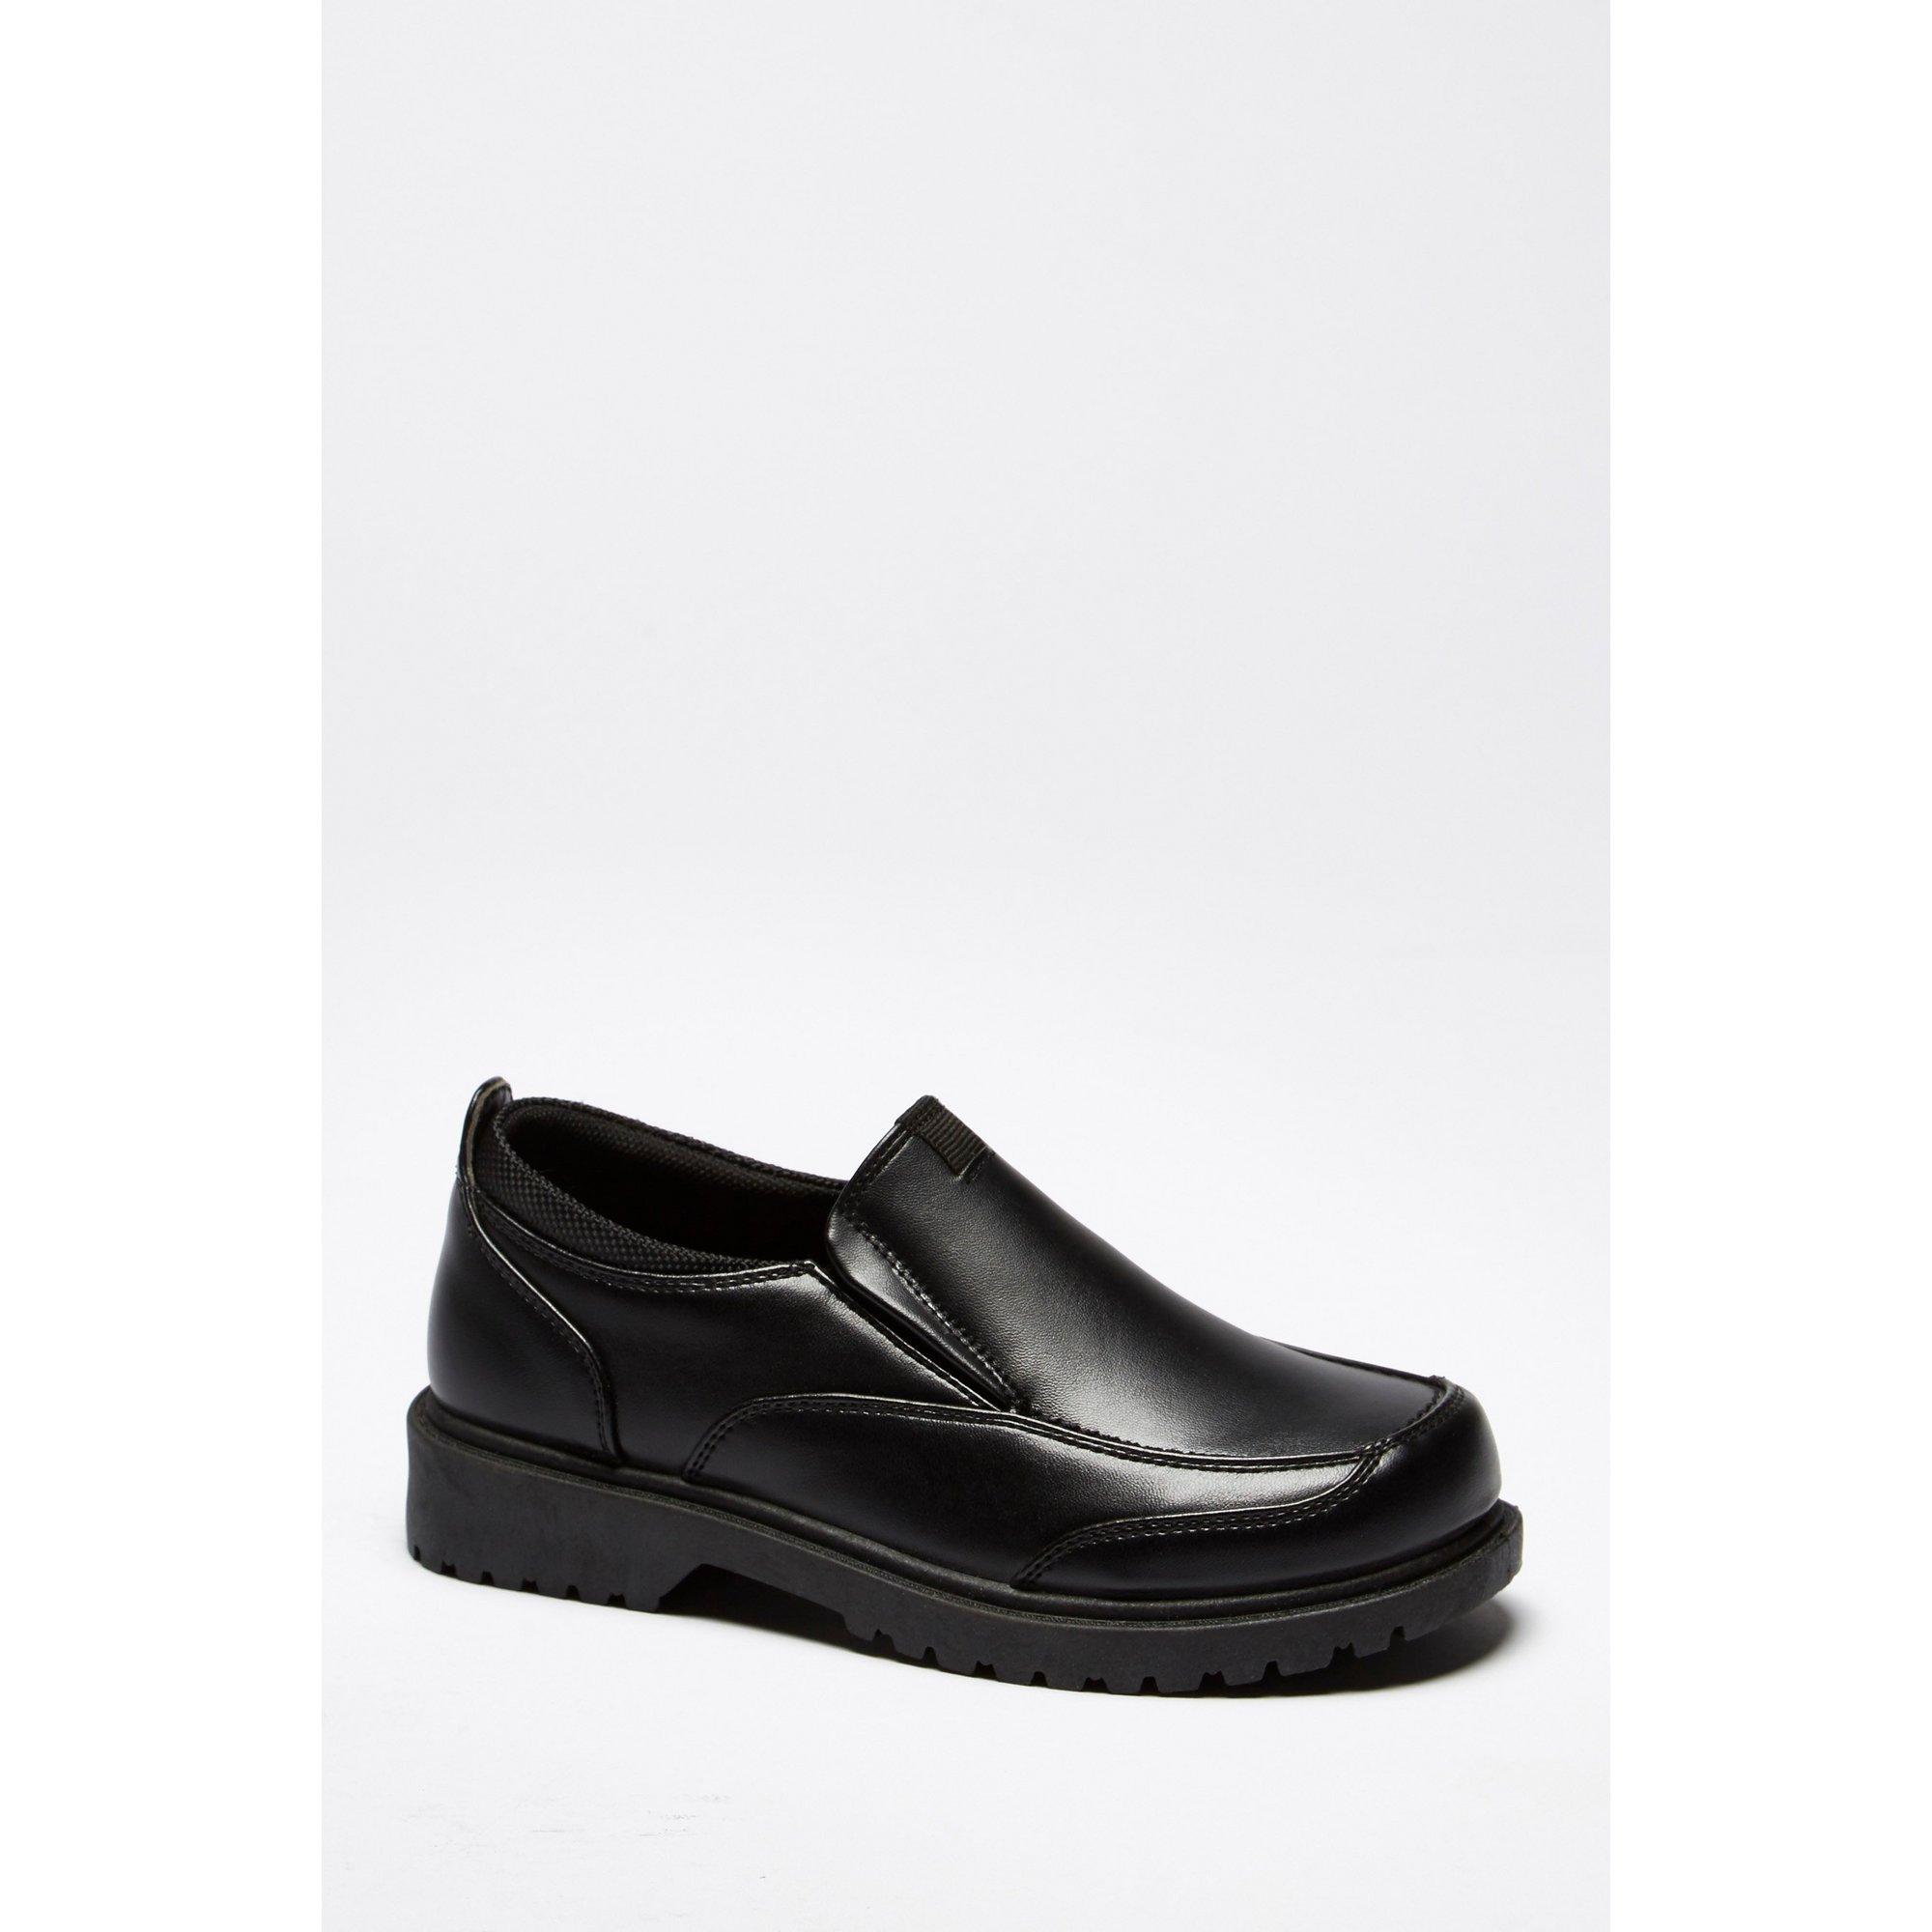 Image of Boys Slip On Shoes